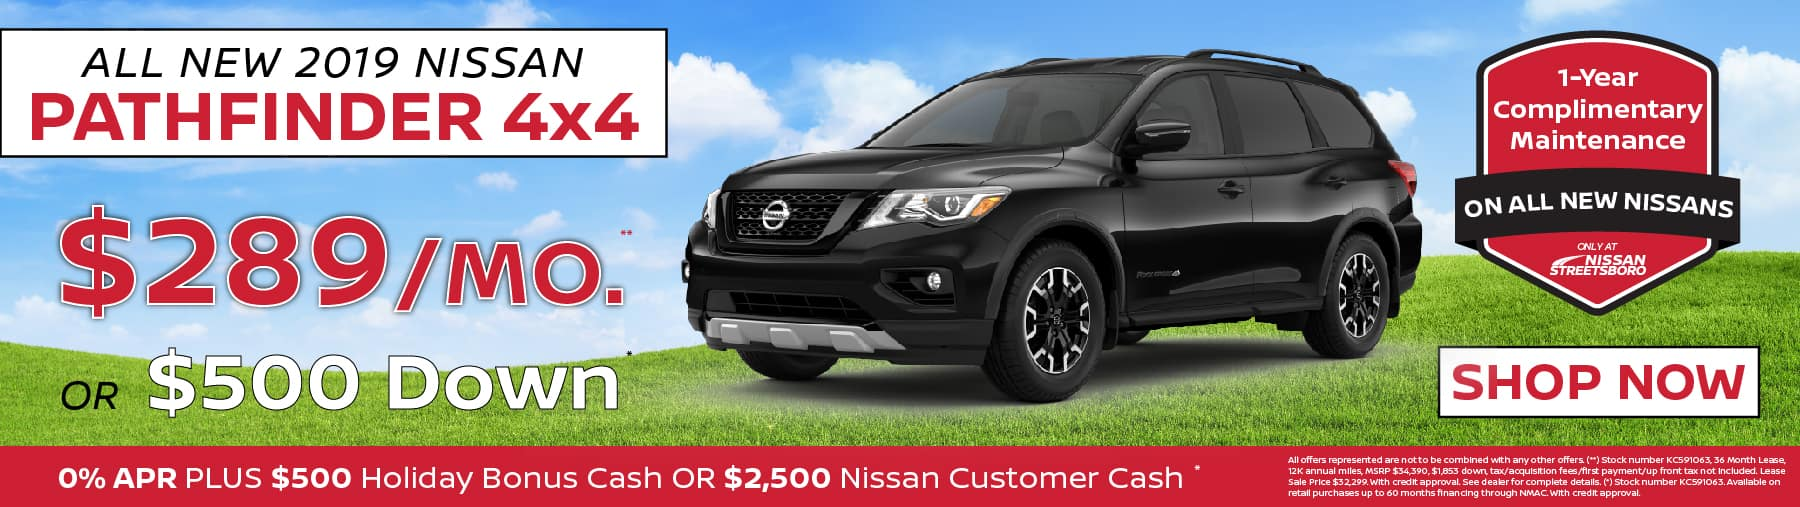 Nissan Pathfinder Special Ohio